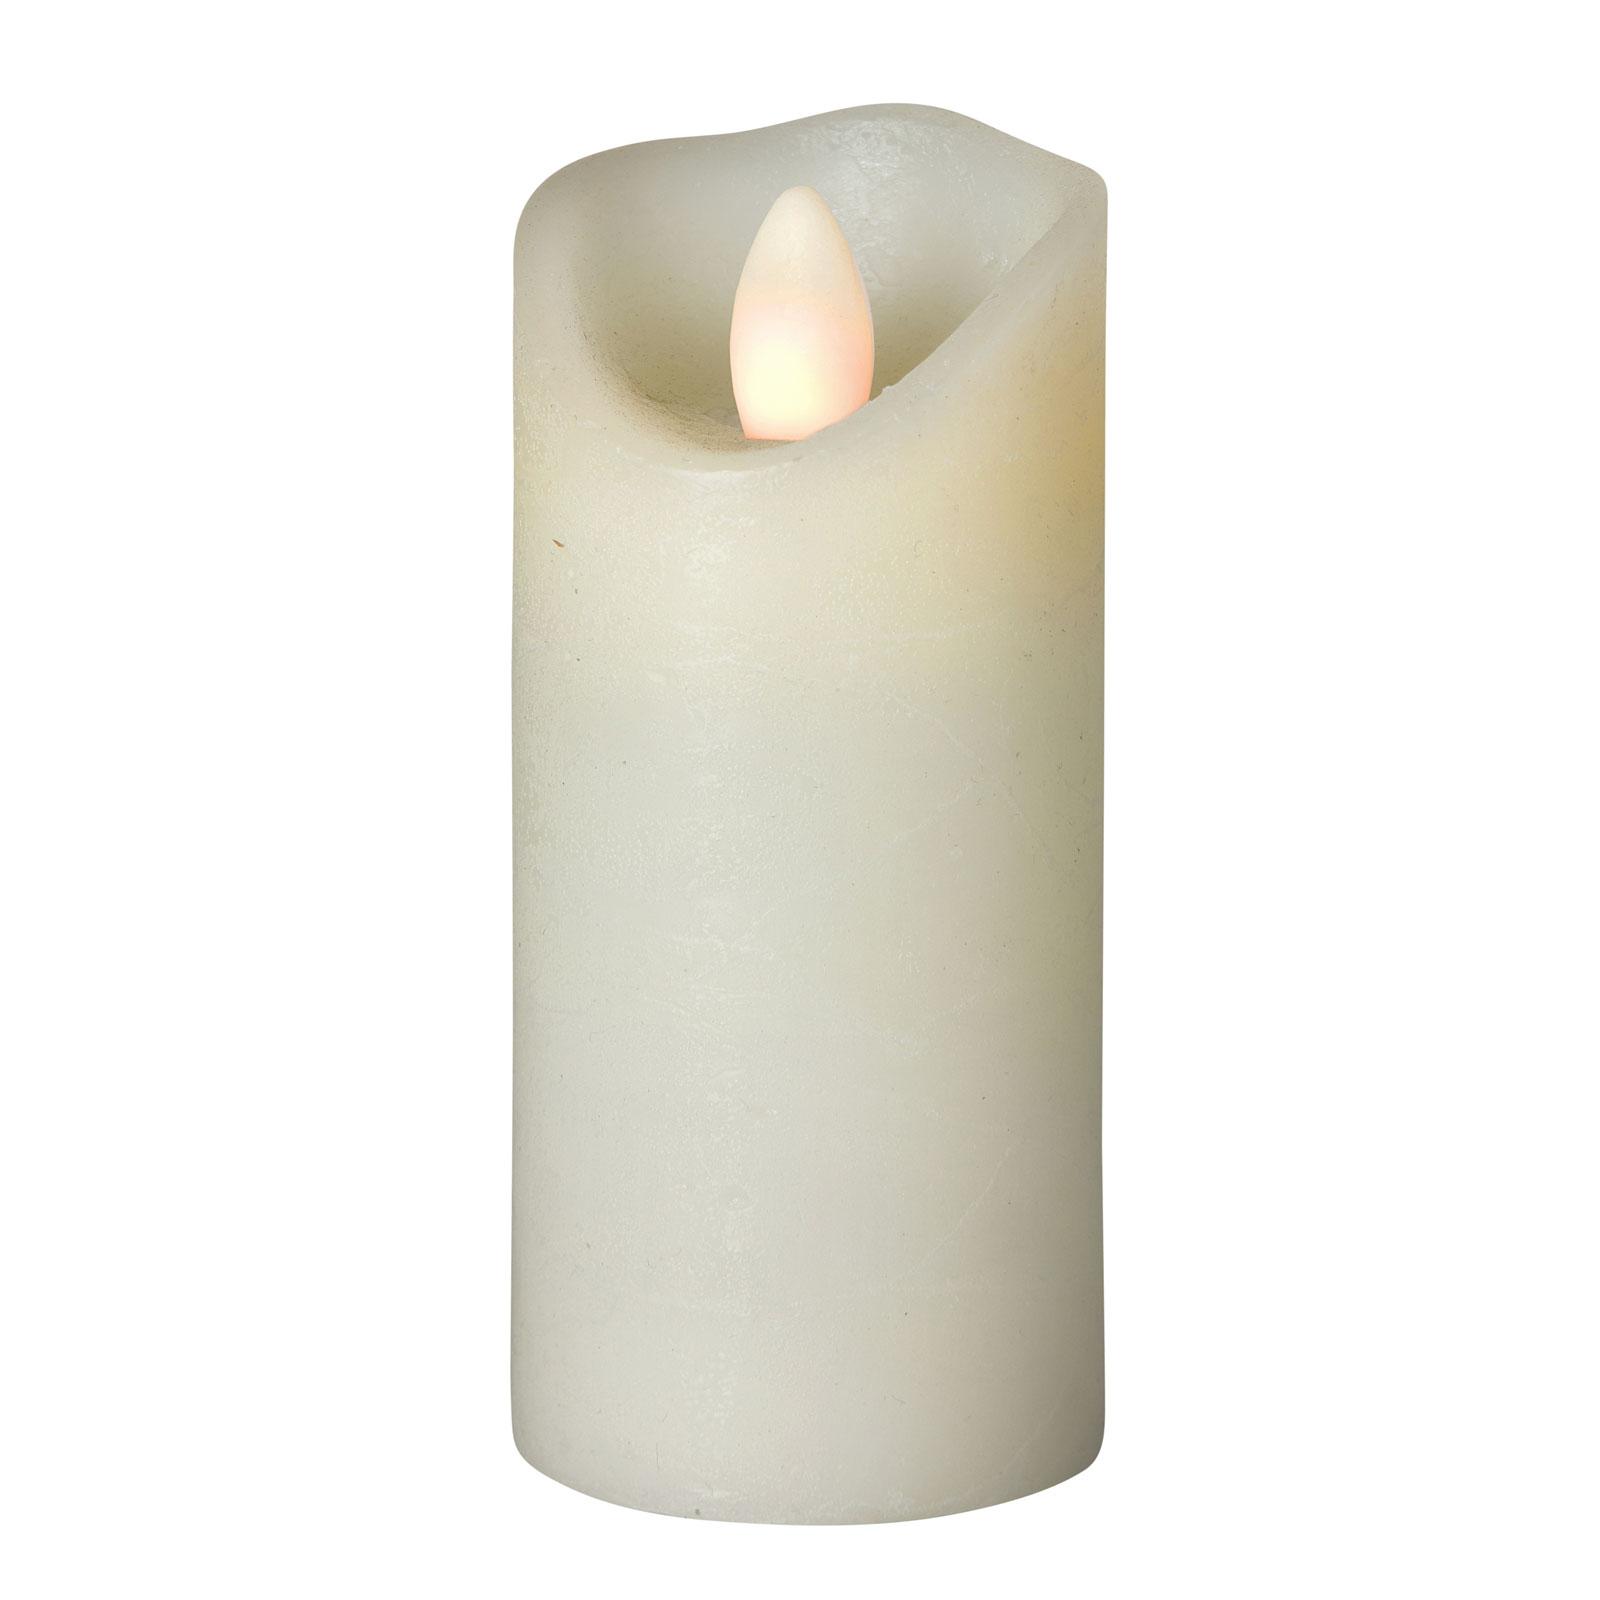 LED-Kerze Shine, Ø 5 cm, elfenbein, Höhe 12,5 cm